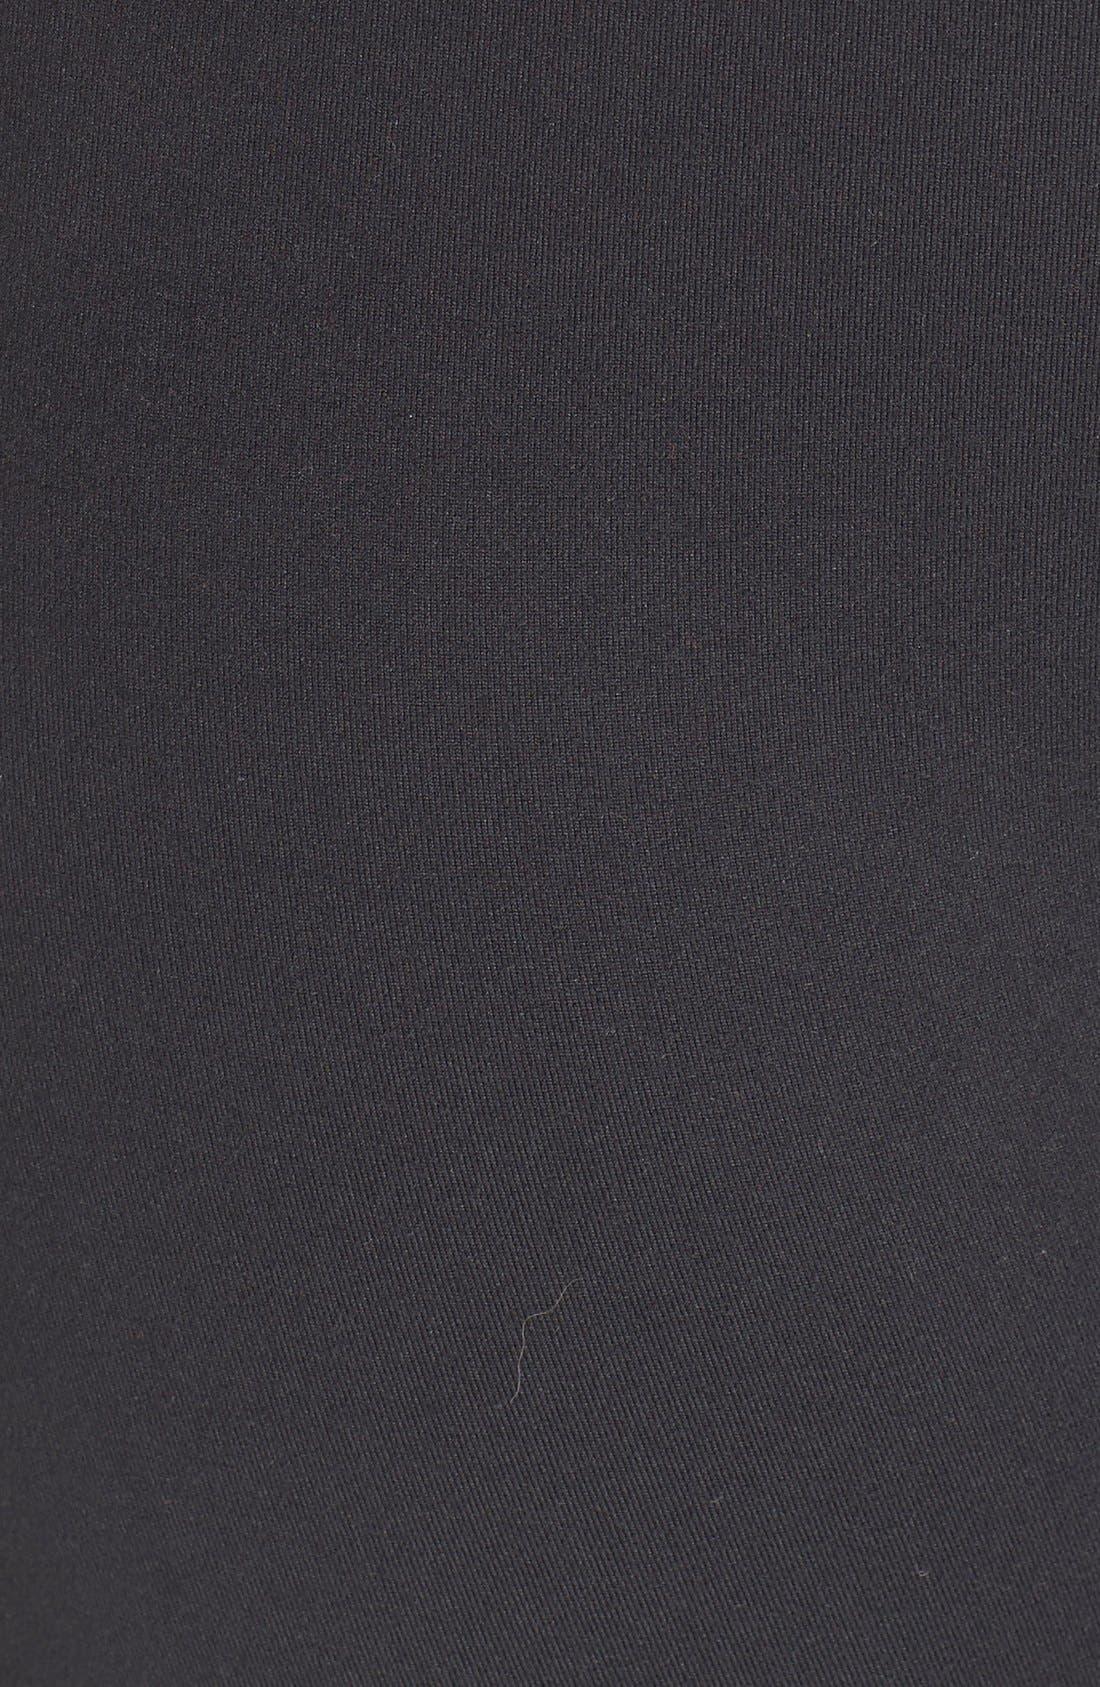 Alternate Image 5  - Zella 'Live In - Caliente' Crop Leggings (Plus Size)